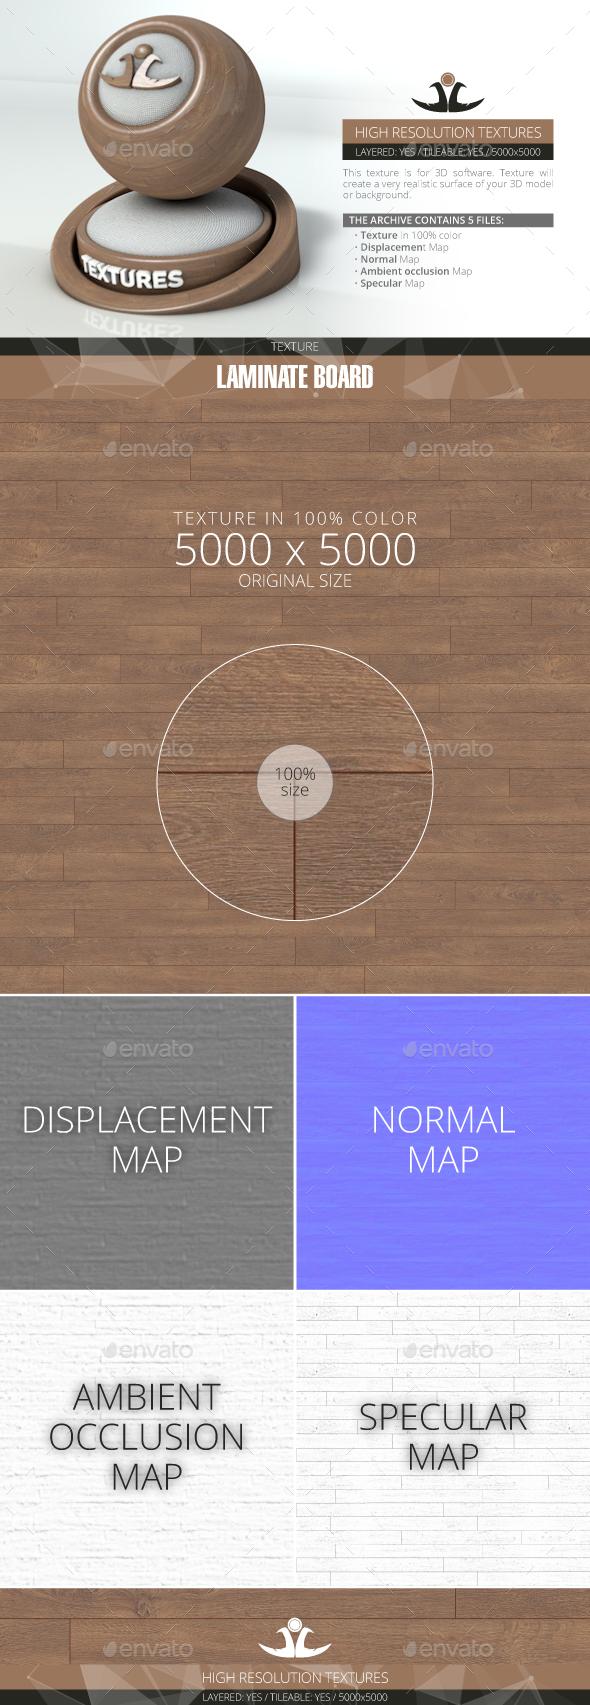 Laminate Board 20 - 3DOcean Item for Sale